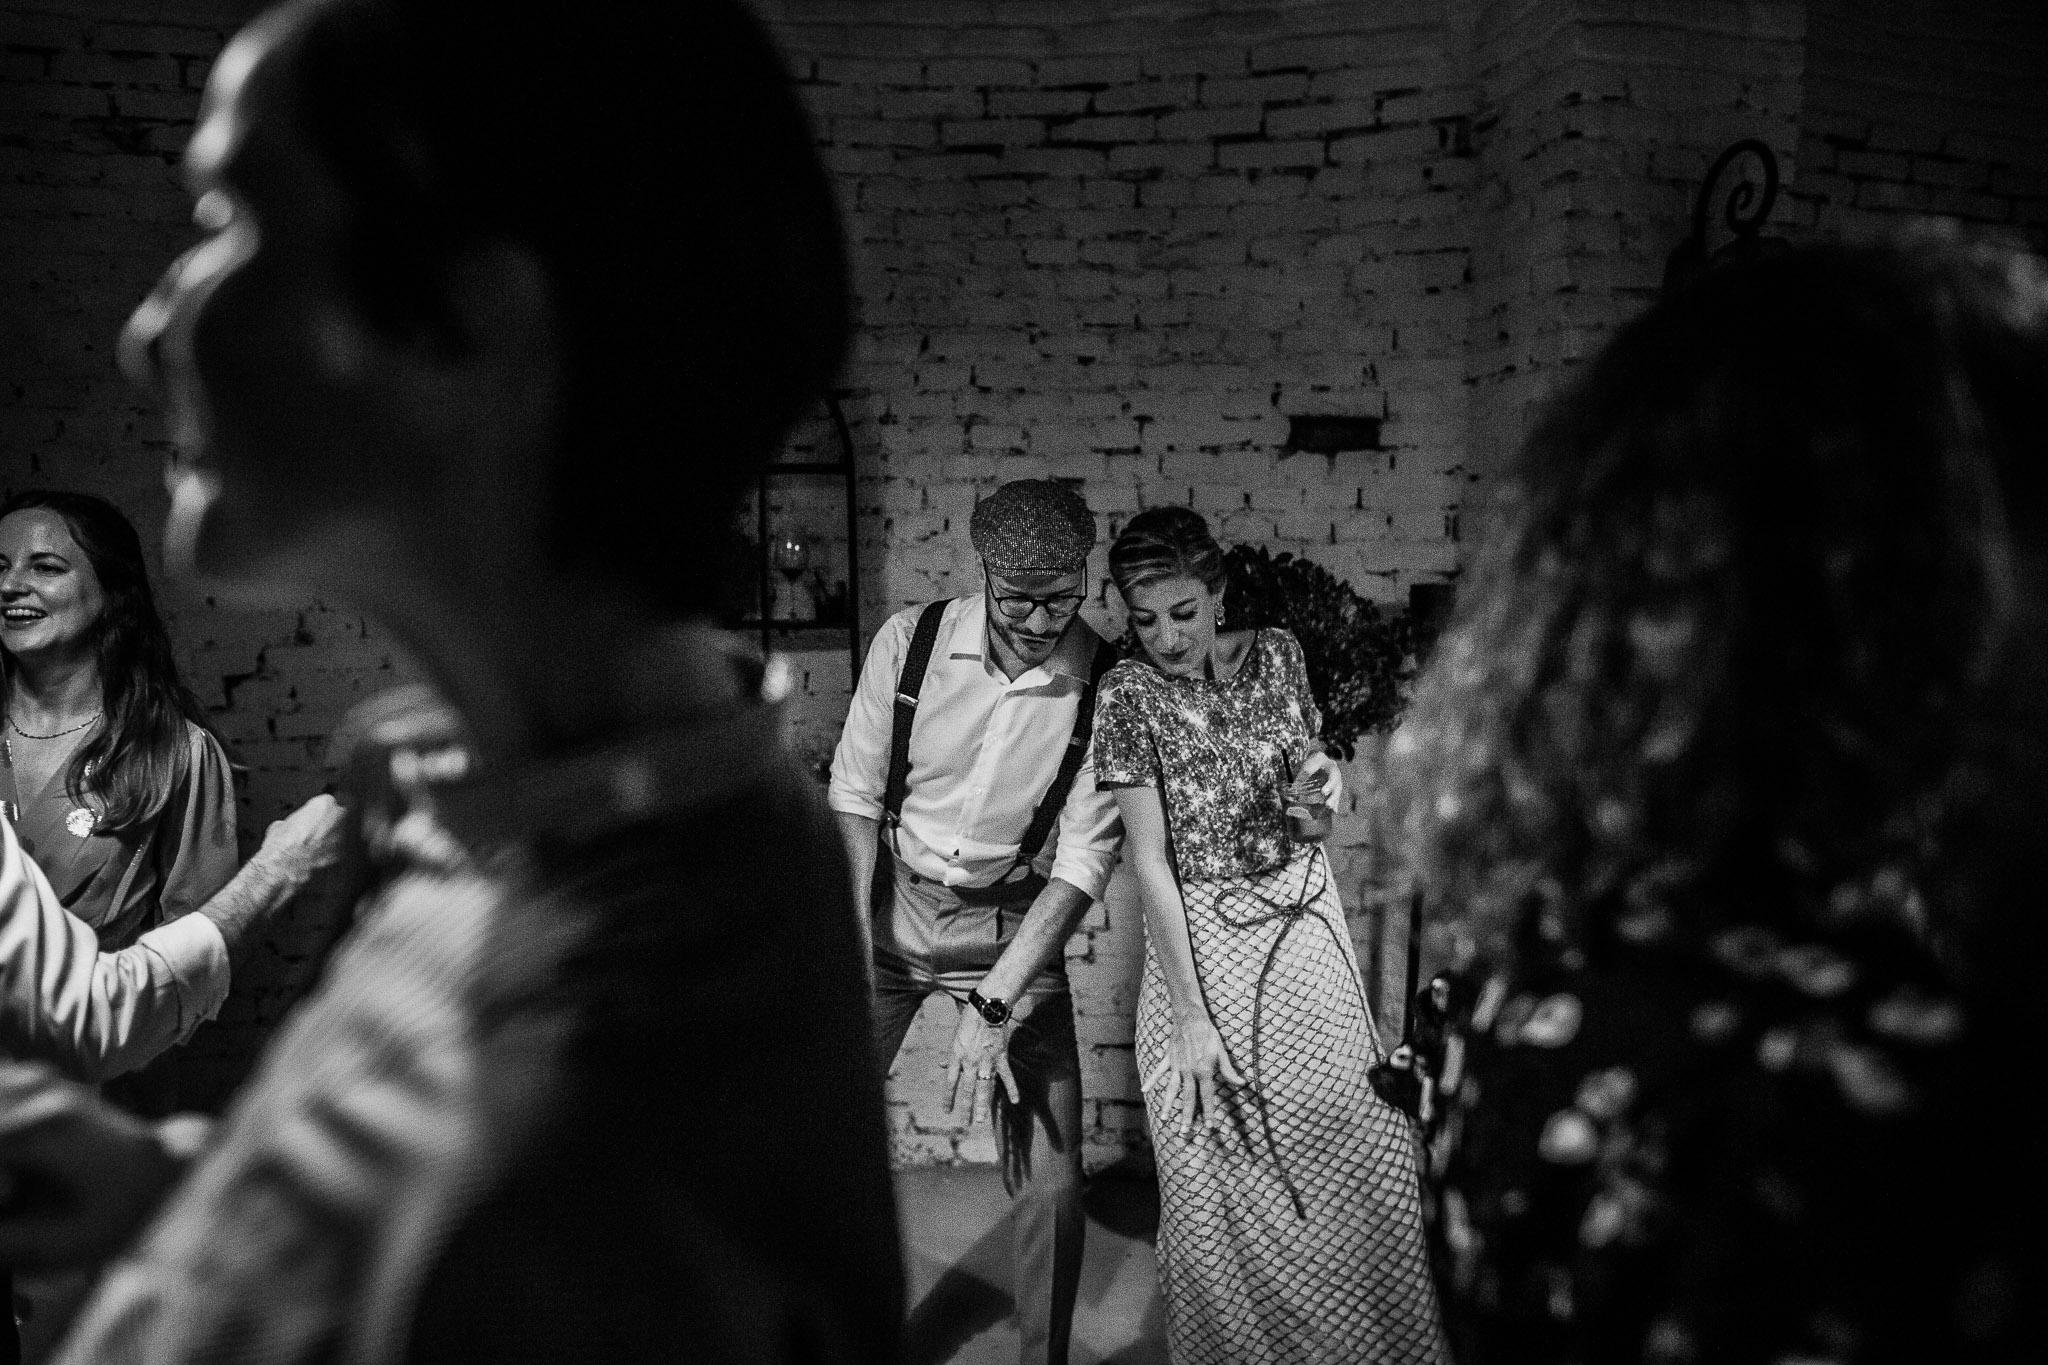 Wedding party at La Villa Hotel, Mombaruzzo at La Villa Hotel, Mombaruzzo